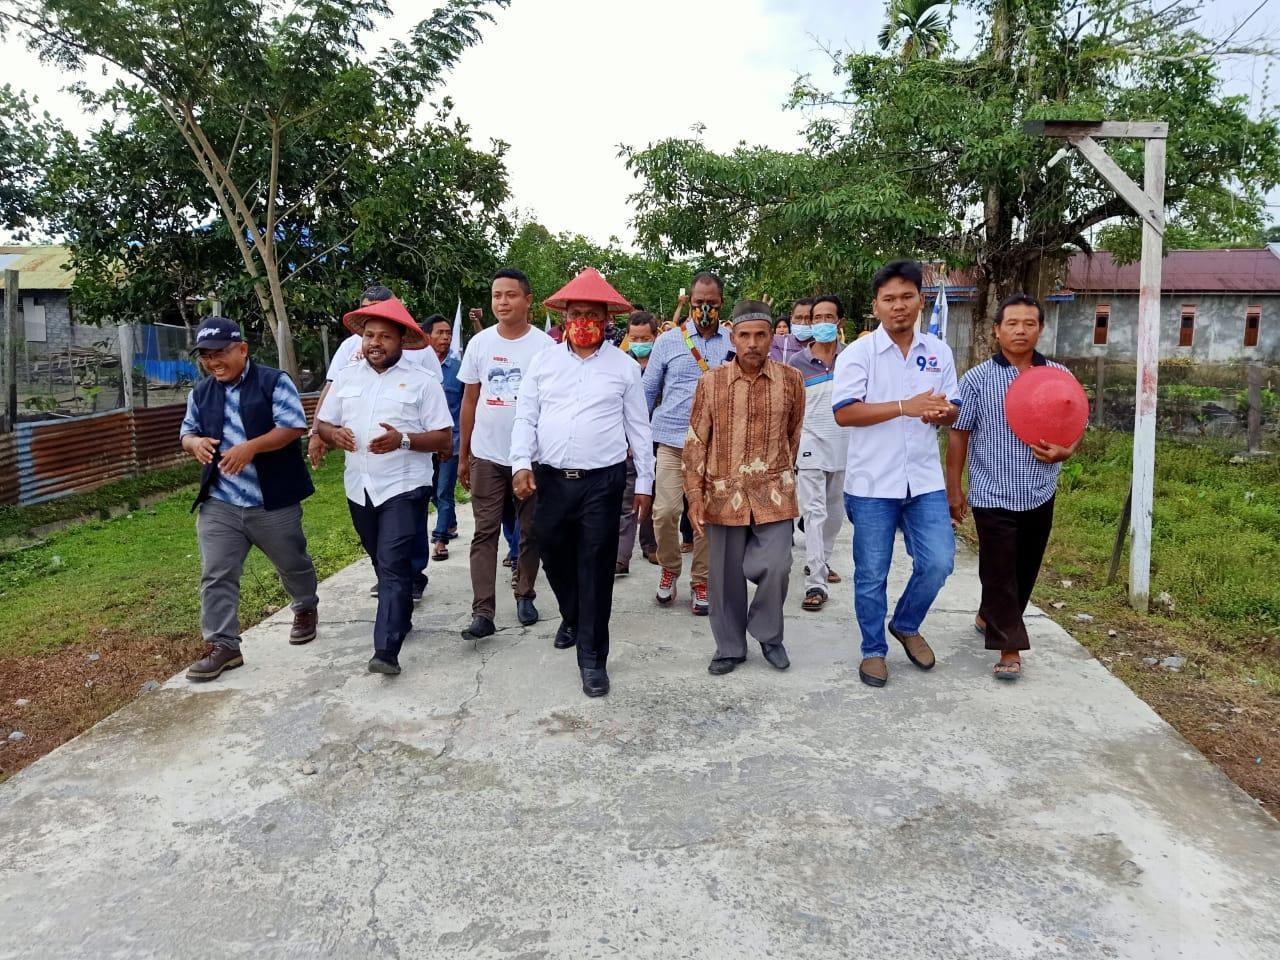 Keluh Jalan Rusak Sejak Tahun 1986, Warga Kampung Wariori Percaya Hermus-Edi Pimpin Manowari Pasti Peduli 4 IMG 20201127 WA0023